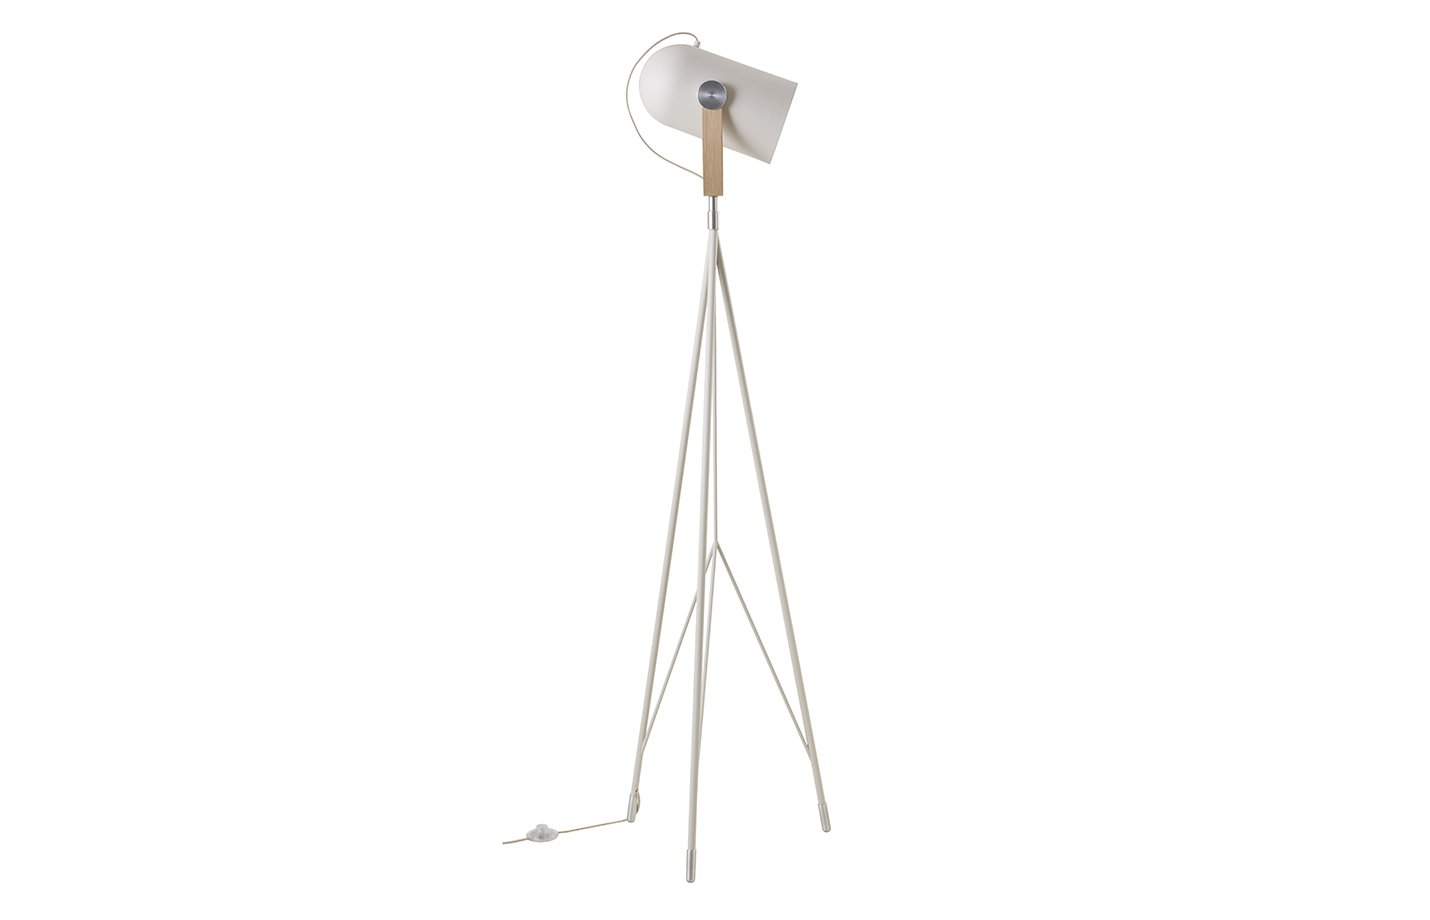 Carronade floor lamp fabiia dubai uae for Floor lamp dubai